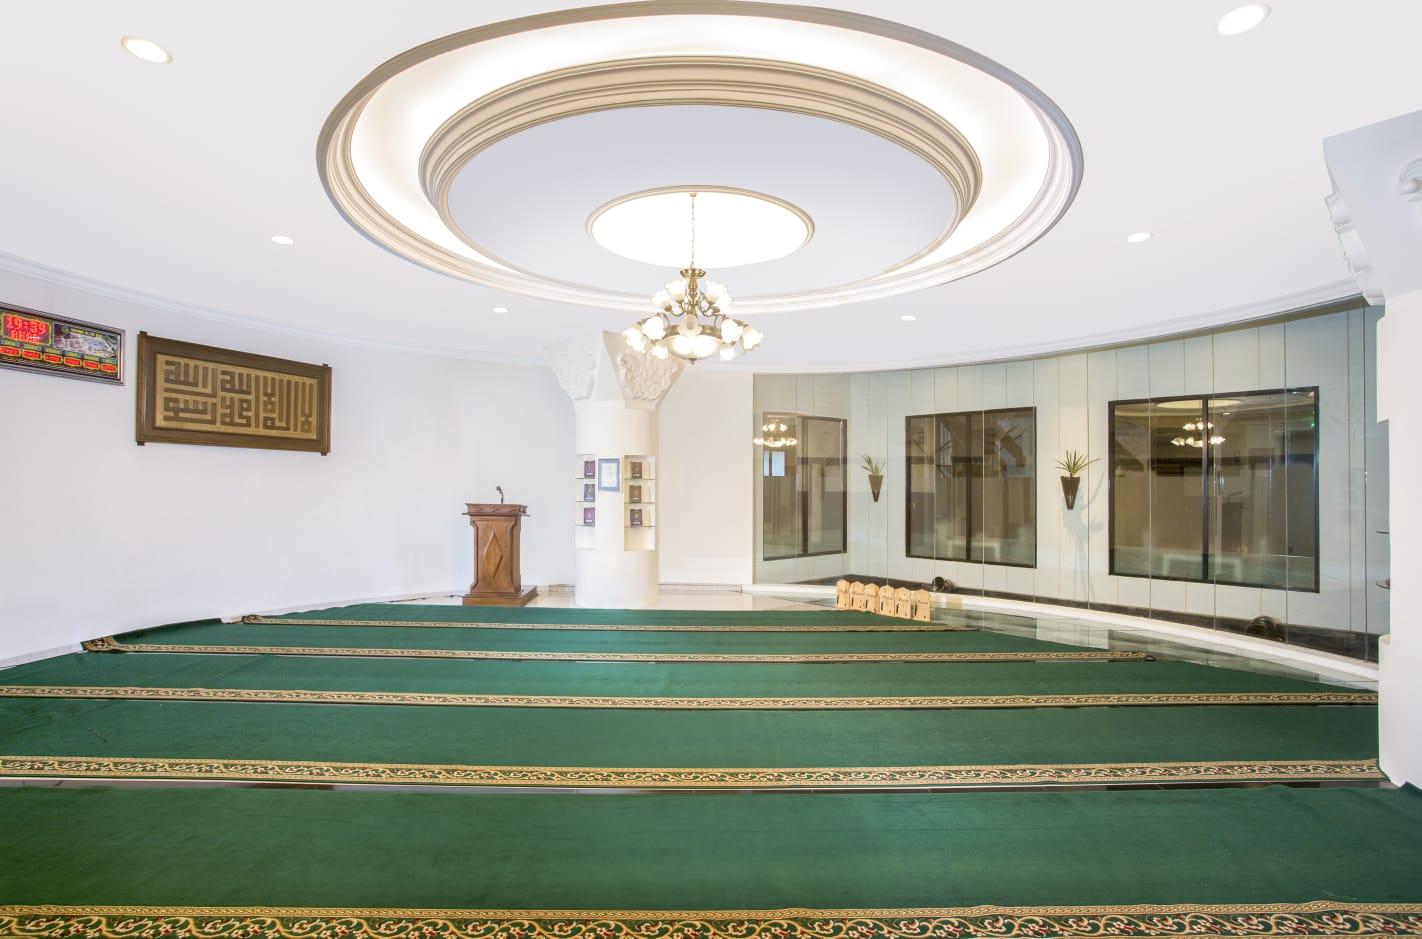 Masjid Al-Mi'raj yang berada di lobby hotel Grand Rohan Jogja